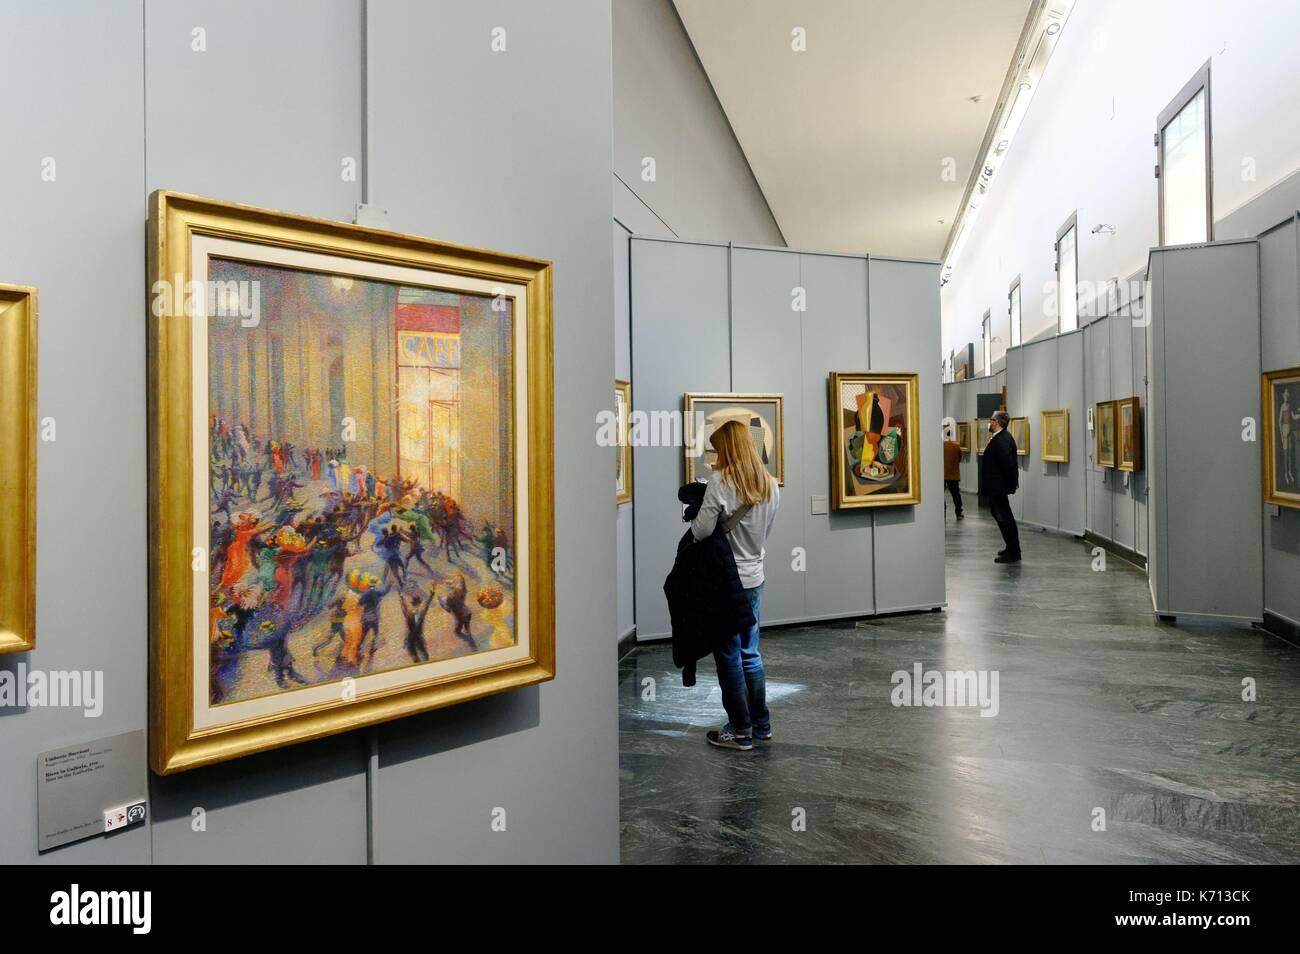 Italy, Lombardy, Milan, baroque palace Brera, Brera Pinacoteca (Pinacoteca di Brera), fine Arts Museum, Riot in - Stock Image